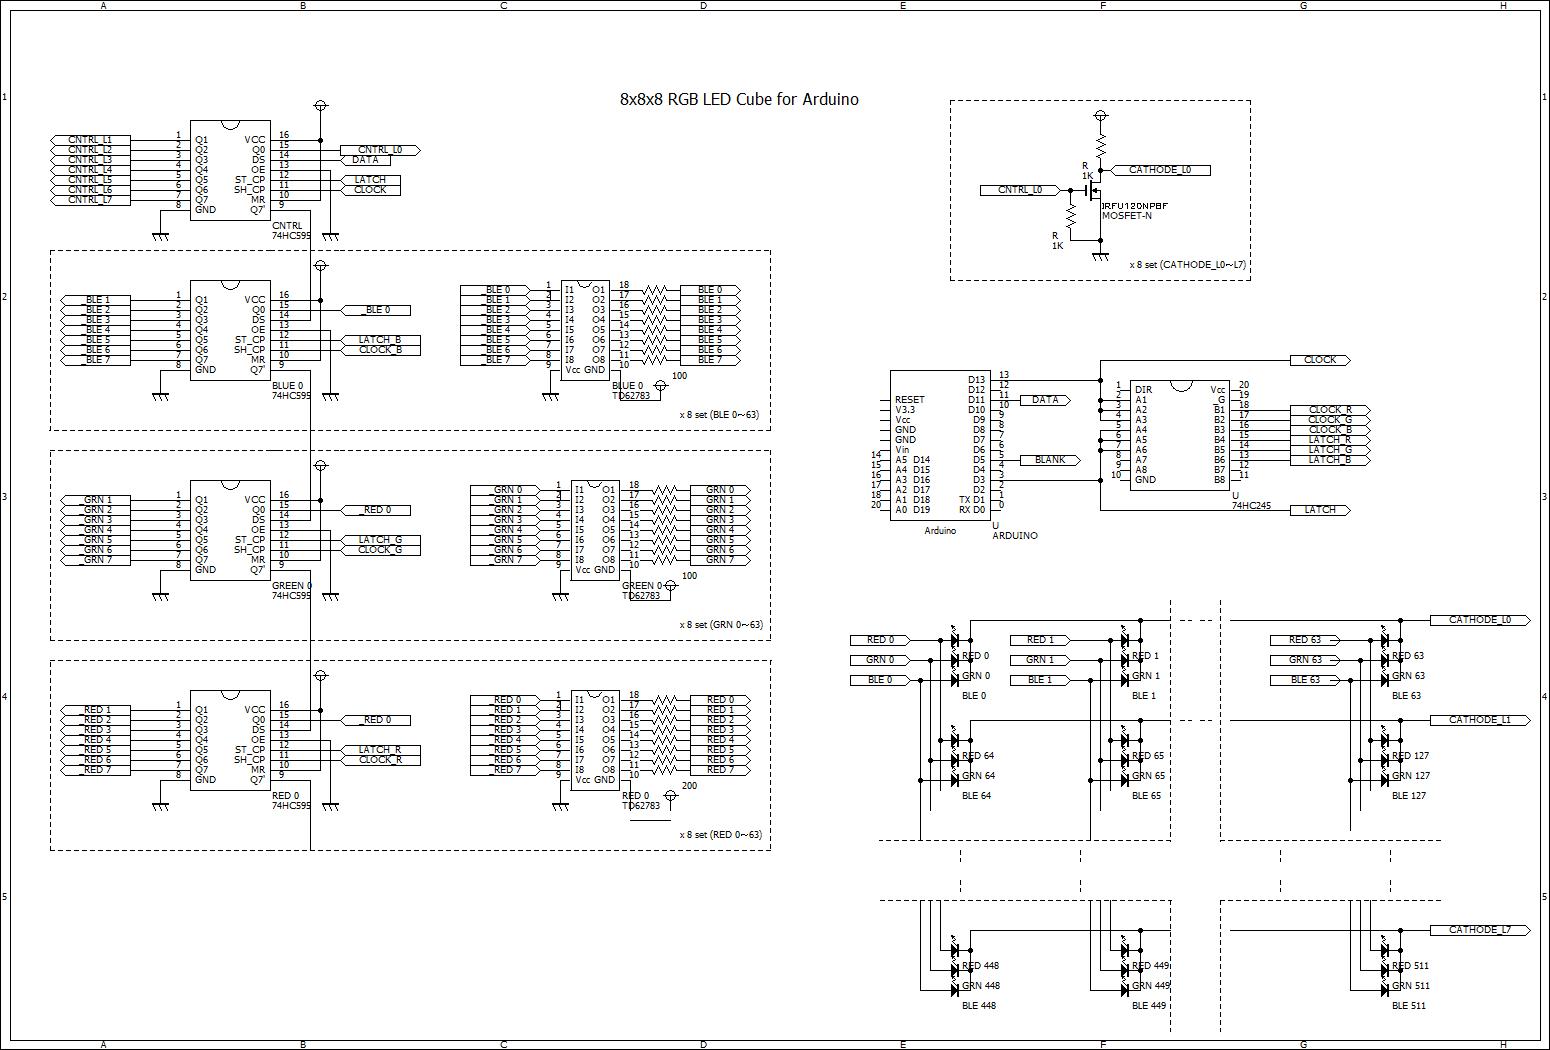 8x8x8 Rgb Led Cube Mics Garage Circuit Diagram Of 8x8x8rgb 2